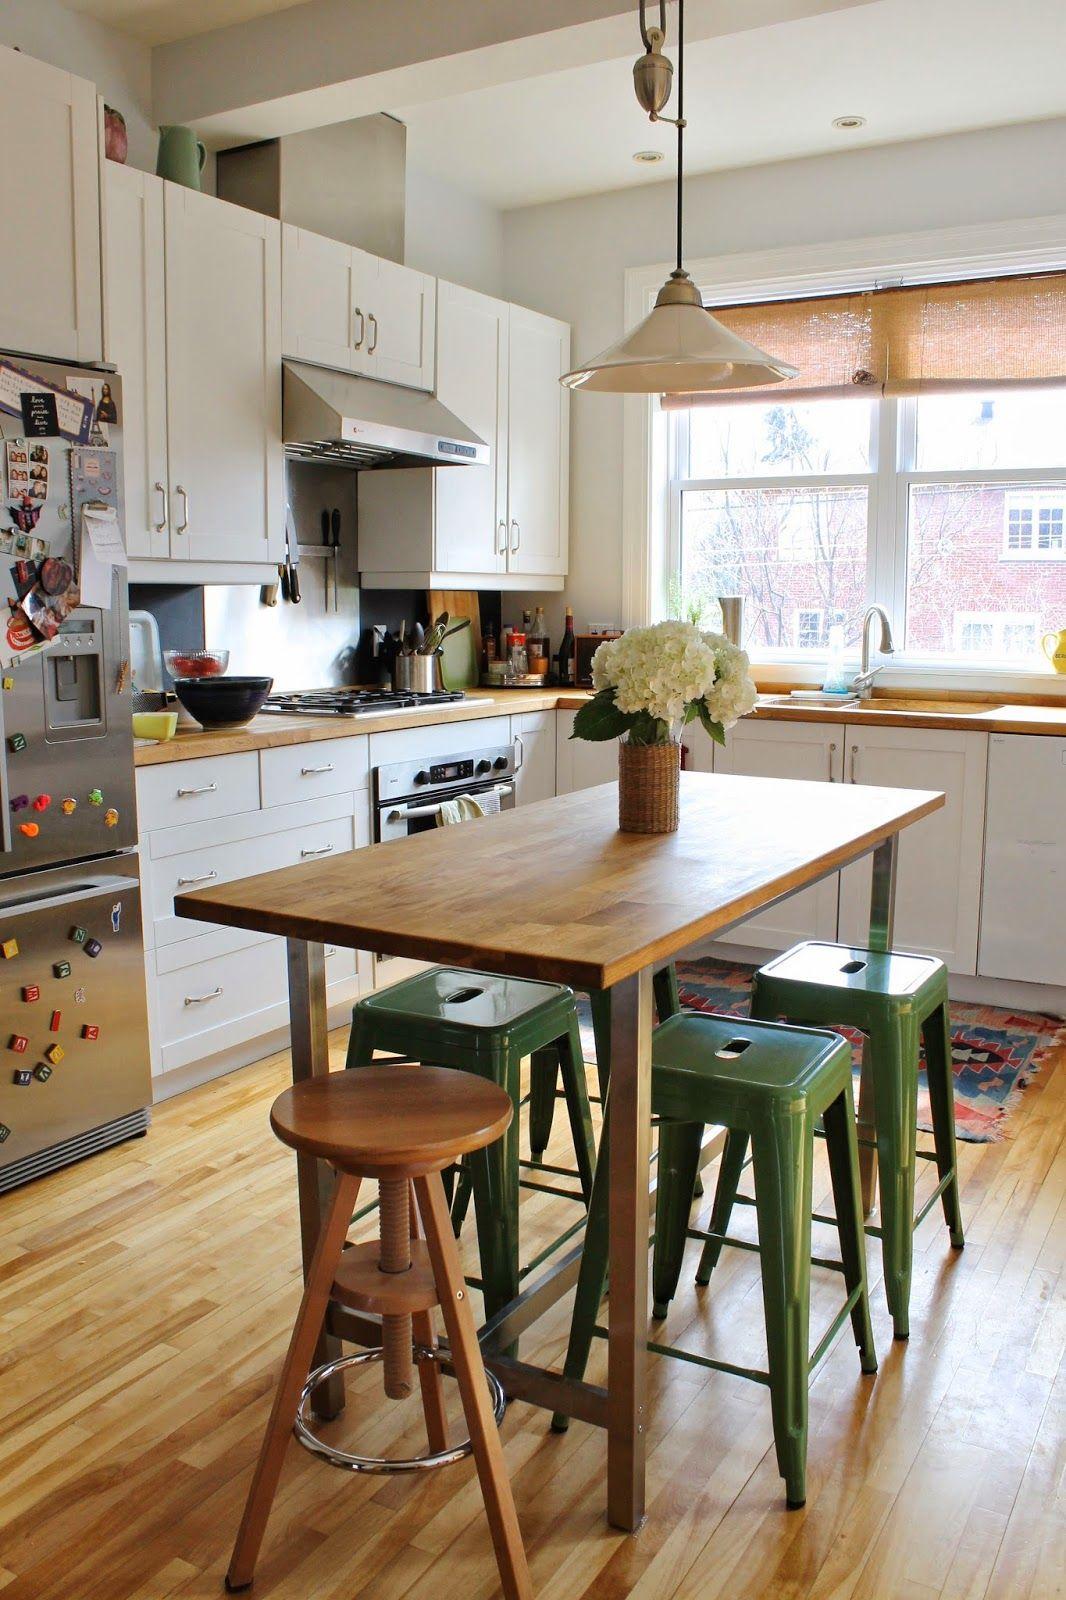 Pour Toujours Kitchen Bar Table Butcher Block Island Kitchen Breakfast Bar Small Kitchen